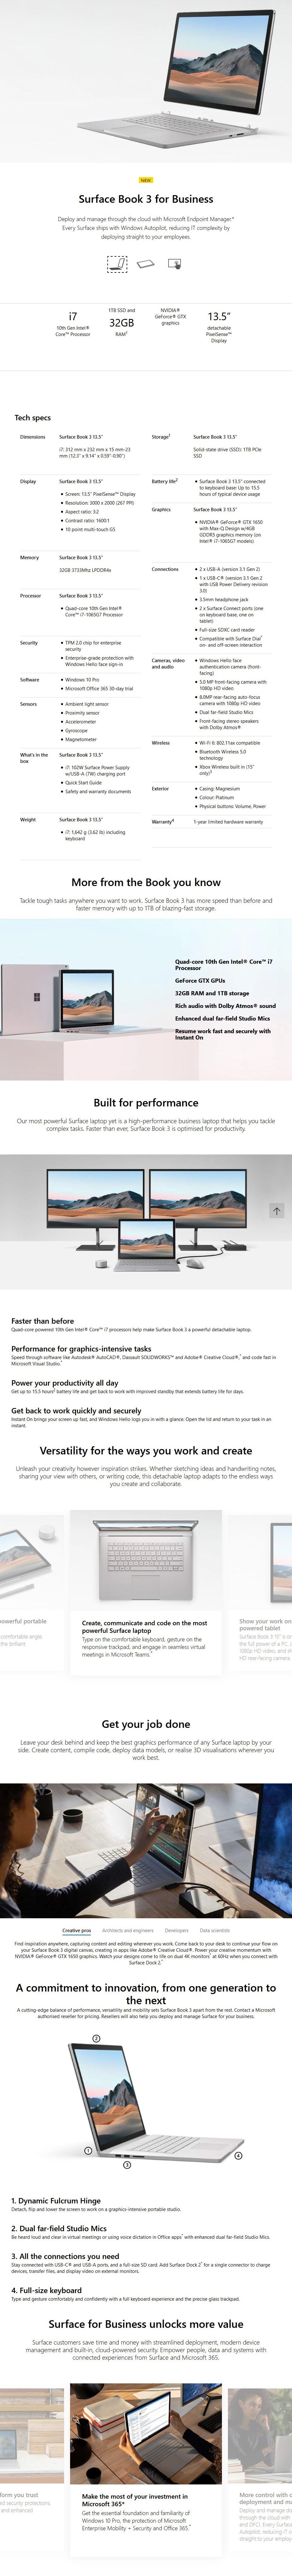 "Microsoft Surface Book 3 13.5"" i7-1065G7 32GB 1TB Nvidia GTX 1650 W10P - Overview 1"